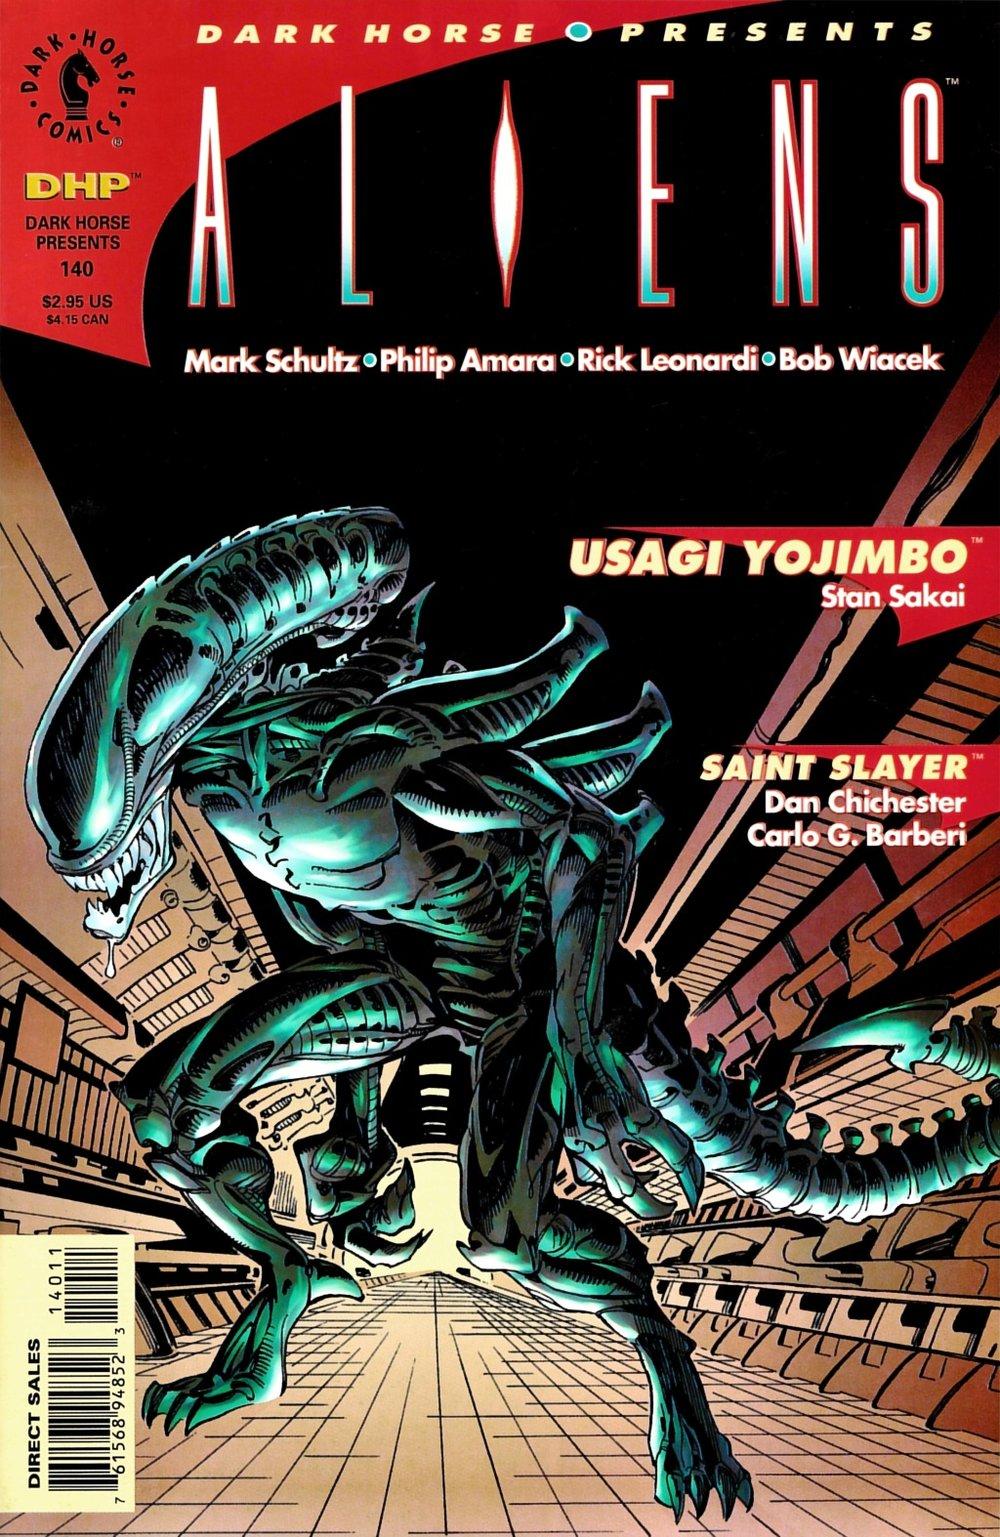 Dark Horse Presents (1986) #140, cover penciled by Rick Leonardi & inked by Bob Wiacek.